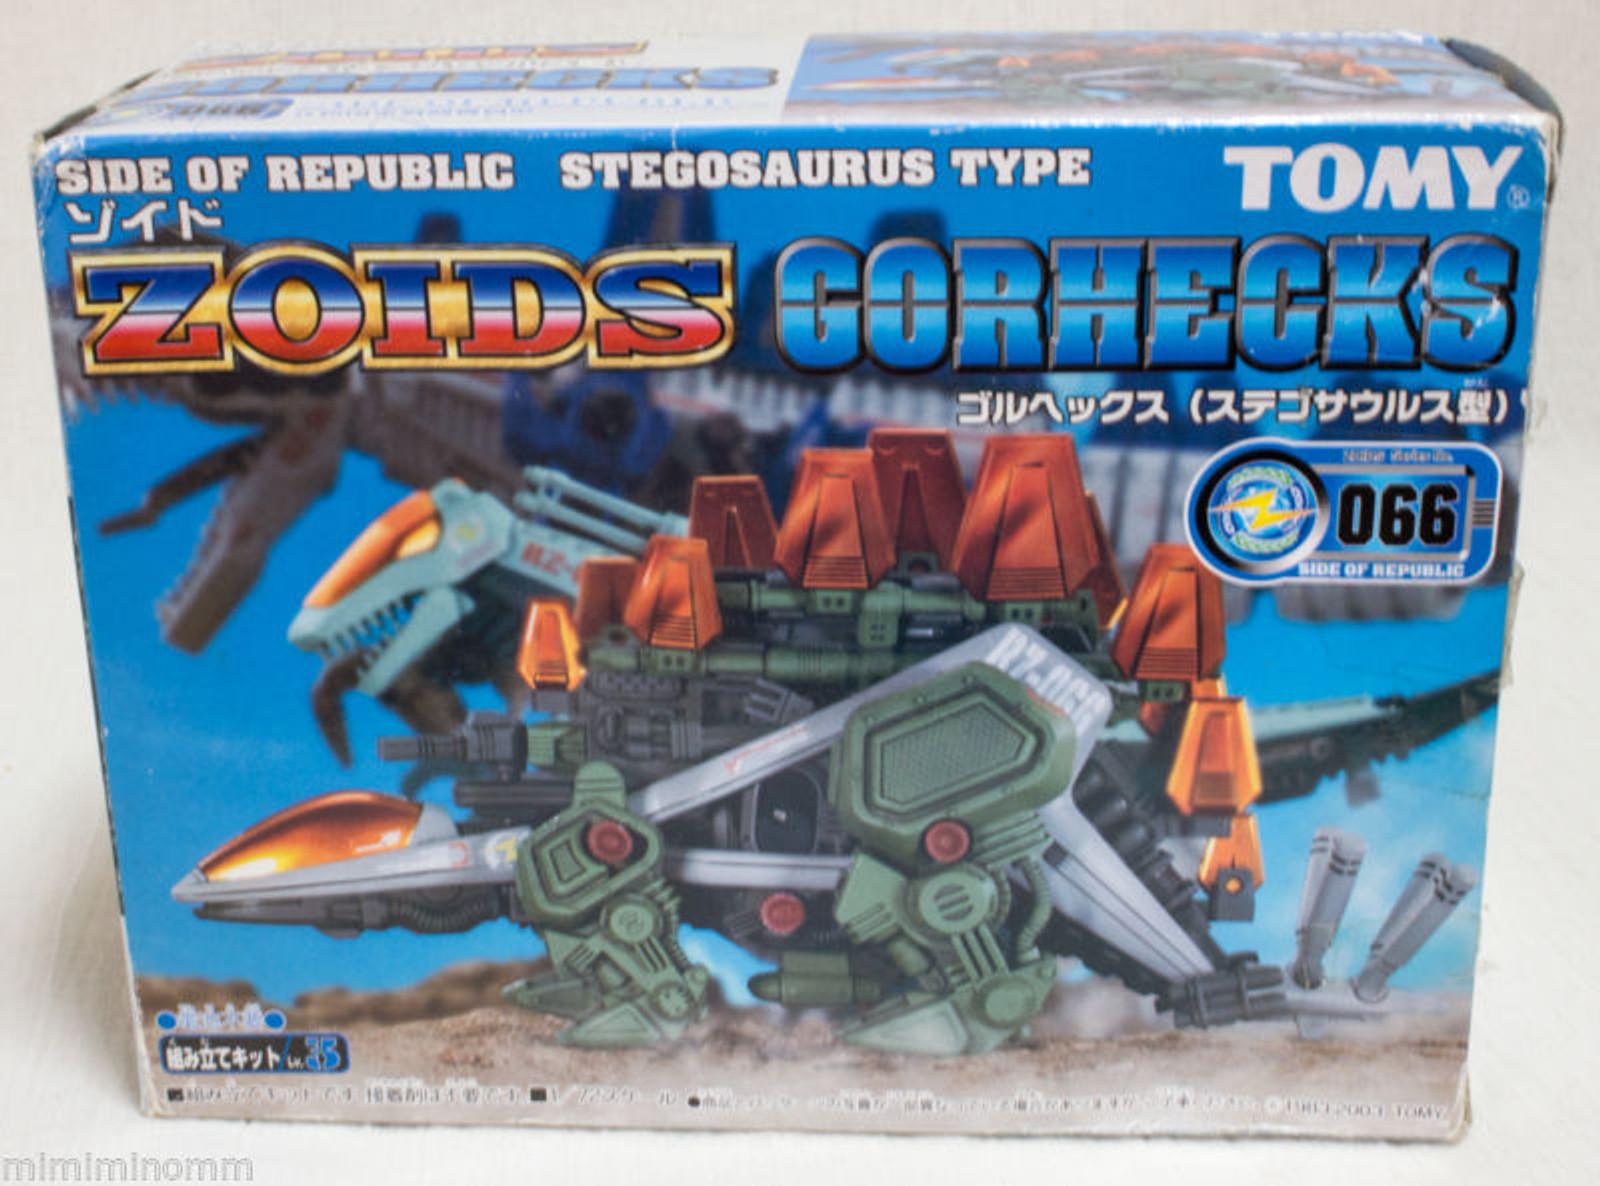 ZOIDS Gorhecks Stegosaurus Type 066 Side of Republic JAPAN TOMY FIGURE MODEL